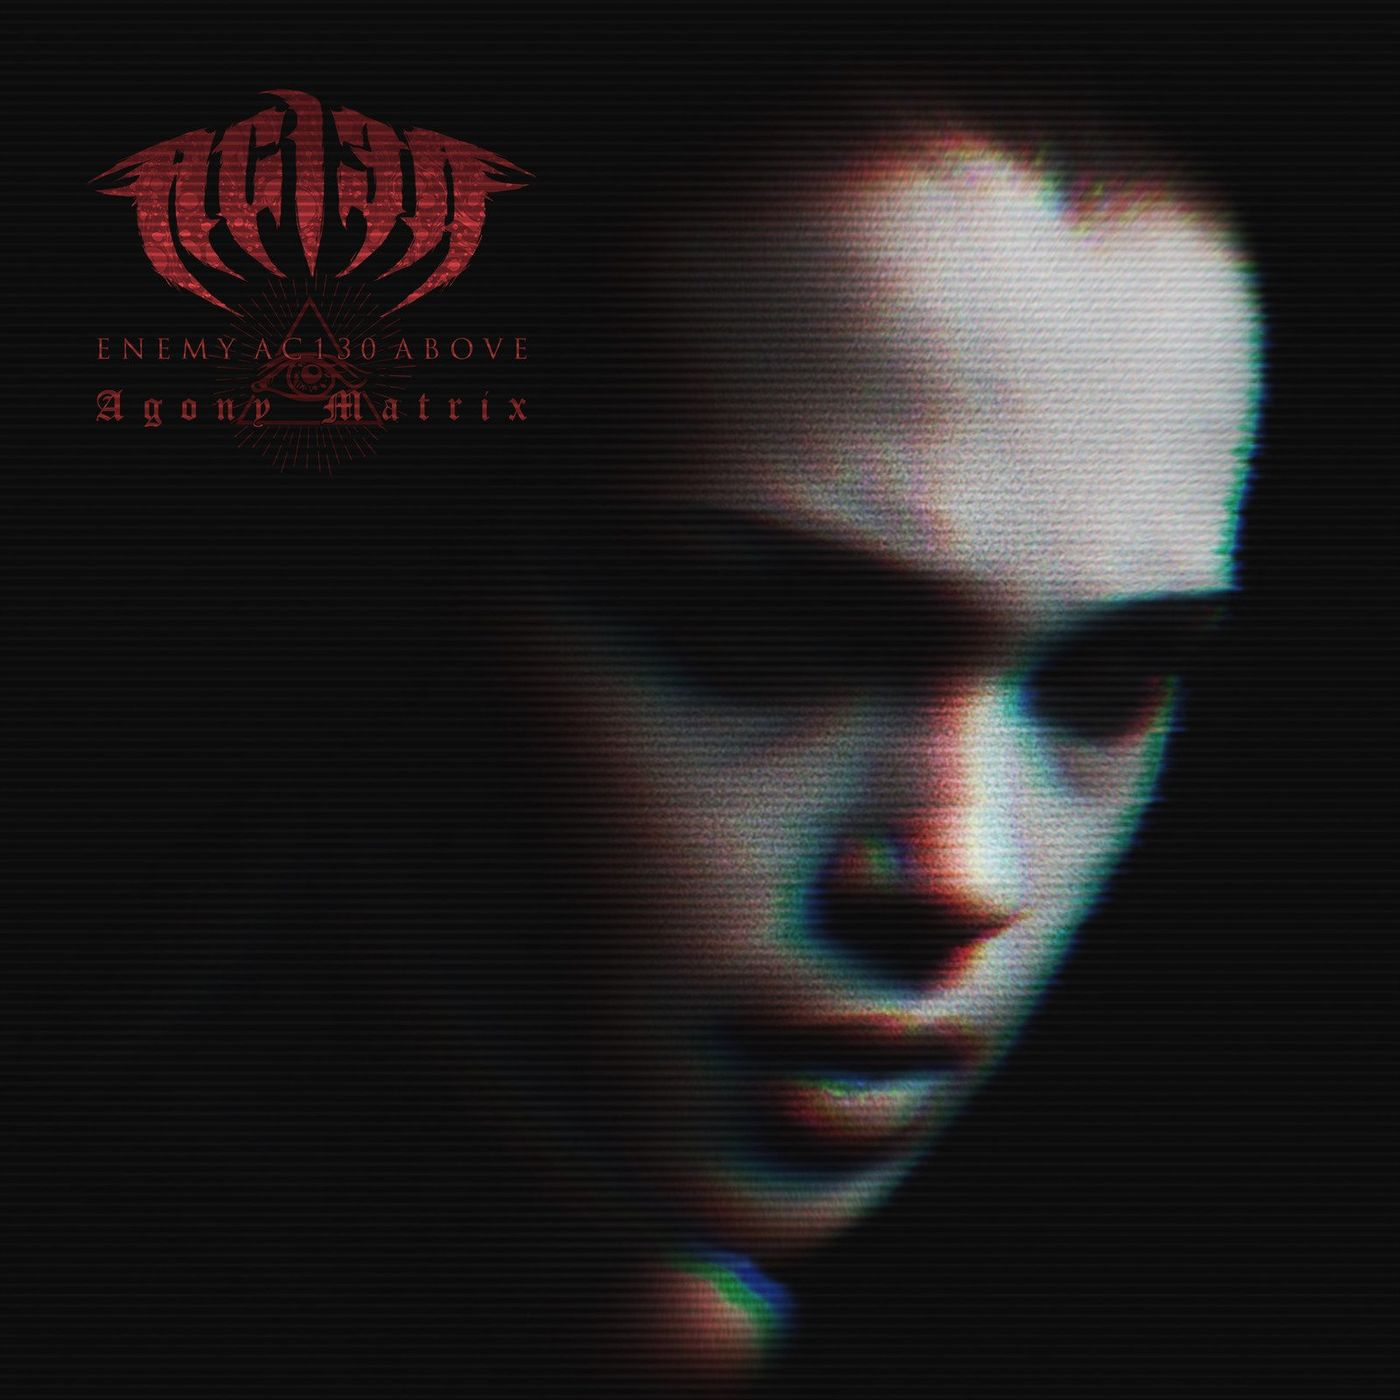 Enemy Ac130 Above - Agony Matrix [single] (2021)